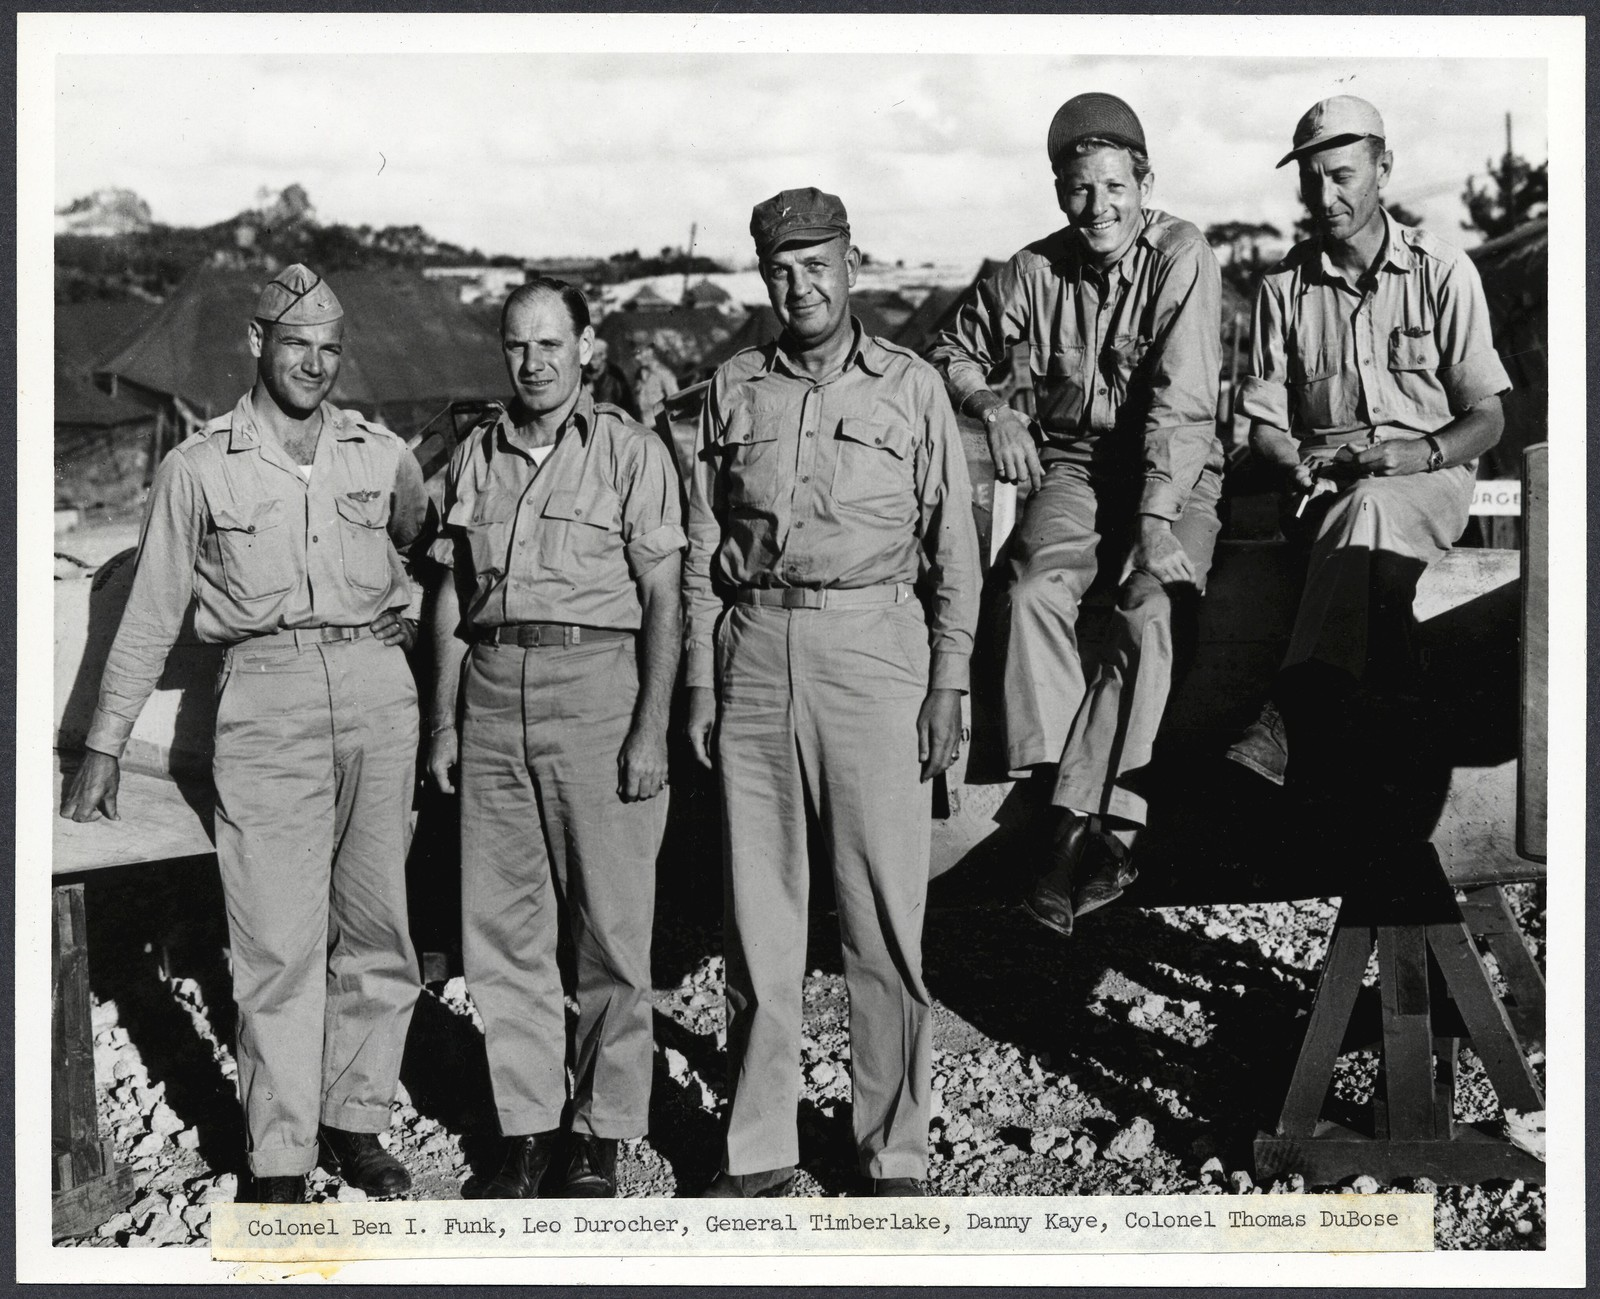 Colonel Ben I. Funk, Leo Durocher, General Timberlake, Danny Kaye, Colonel Thomas Dubose [in Okinawa], [1945]